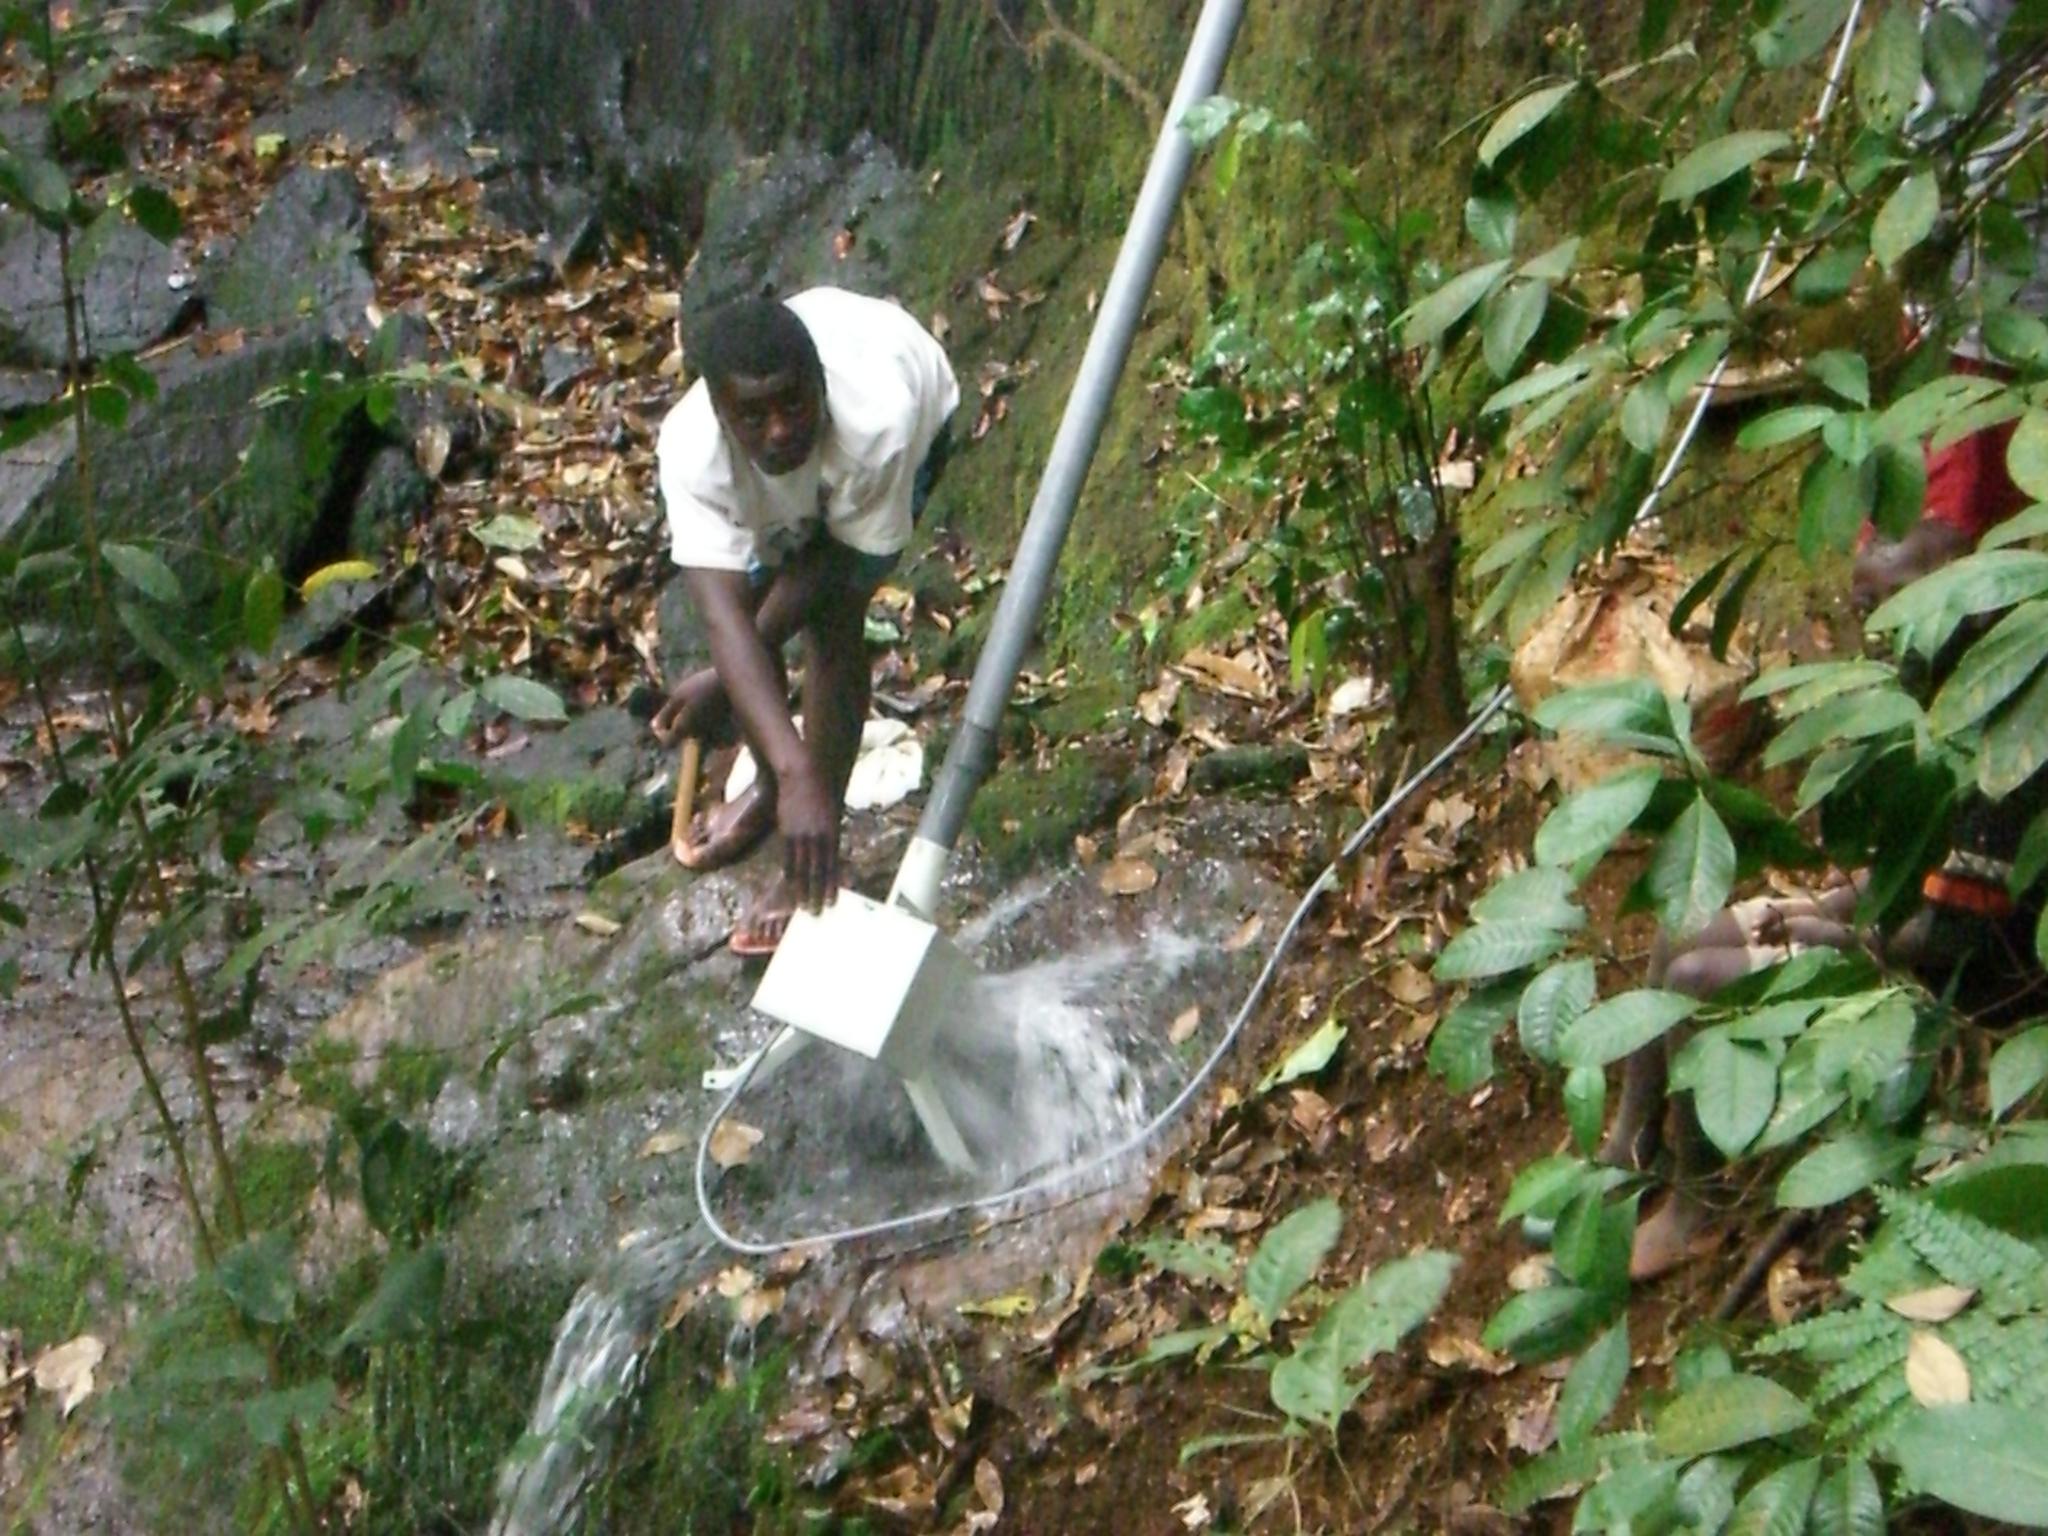 Neues aus Kamerun: Berichte unserer freiwilligen Helfer